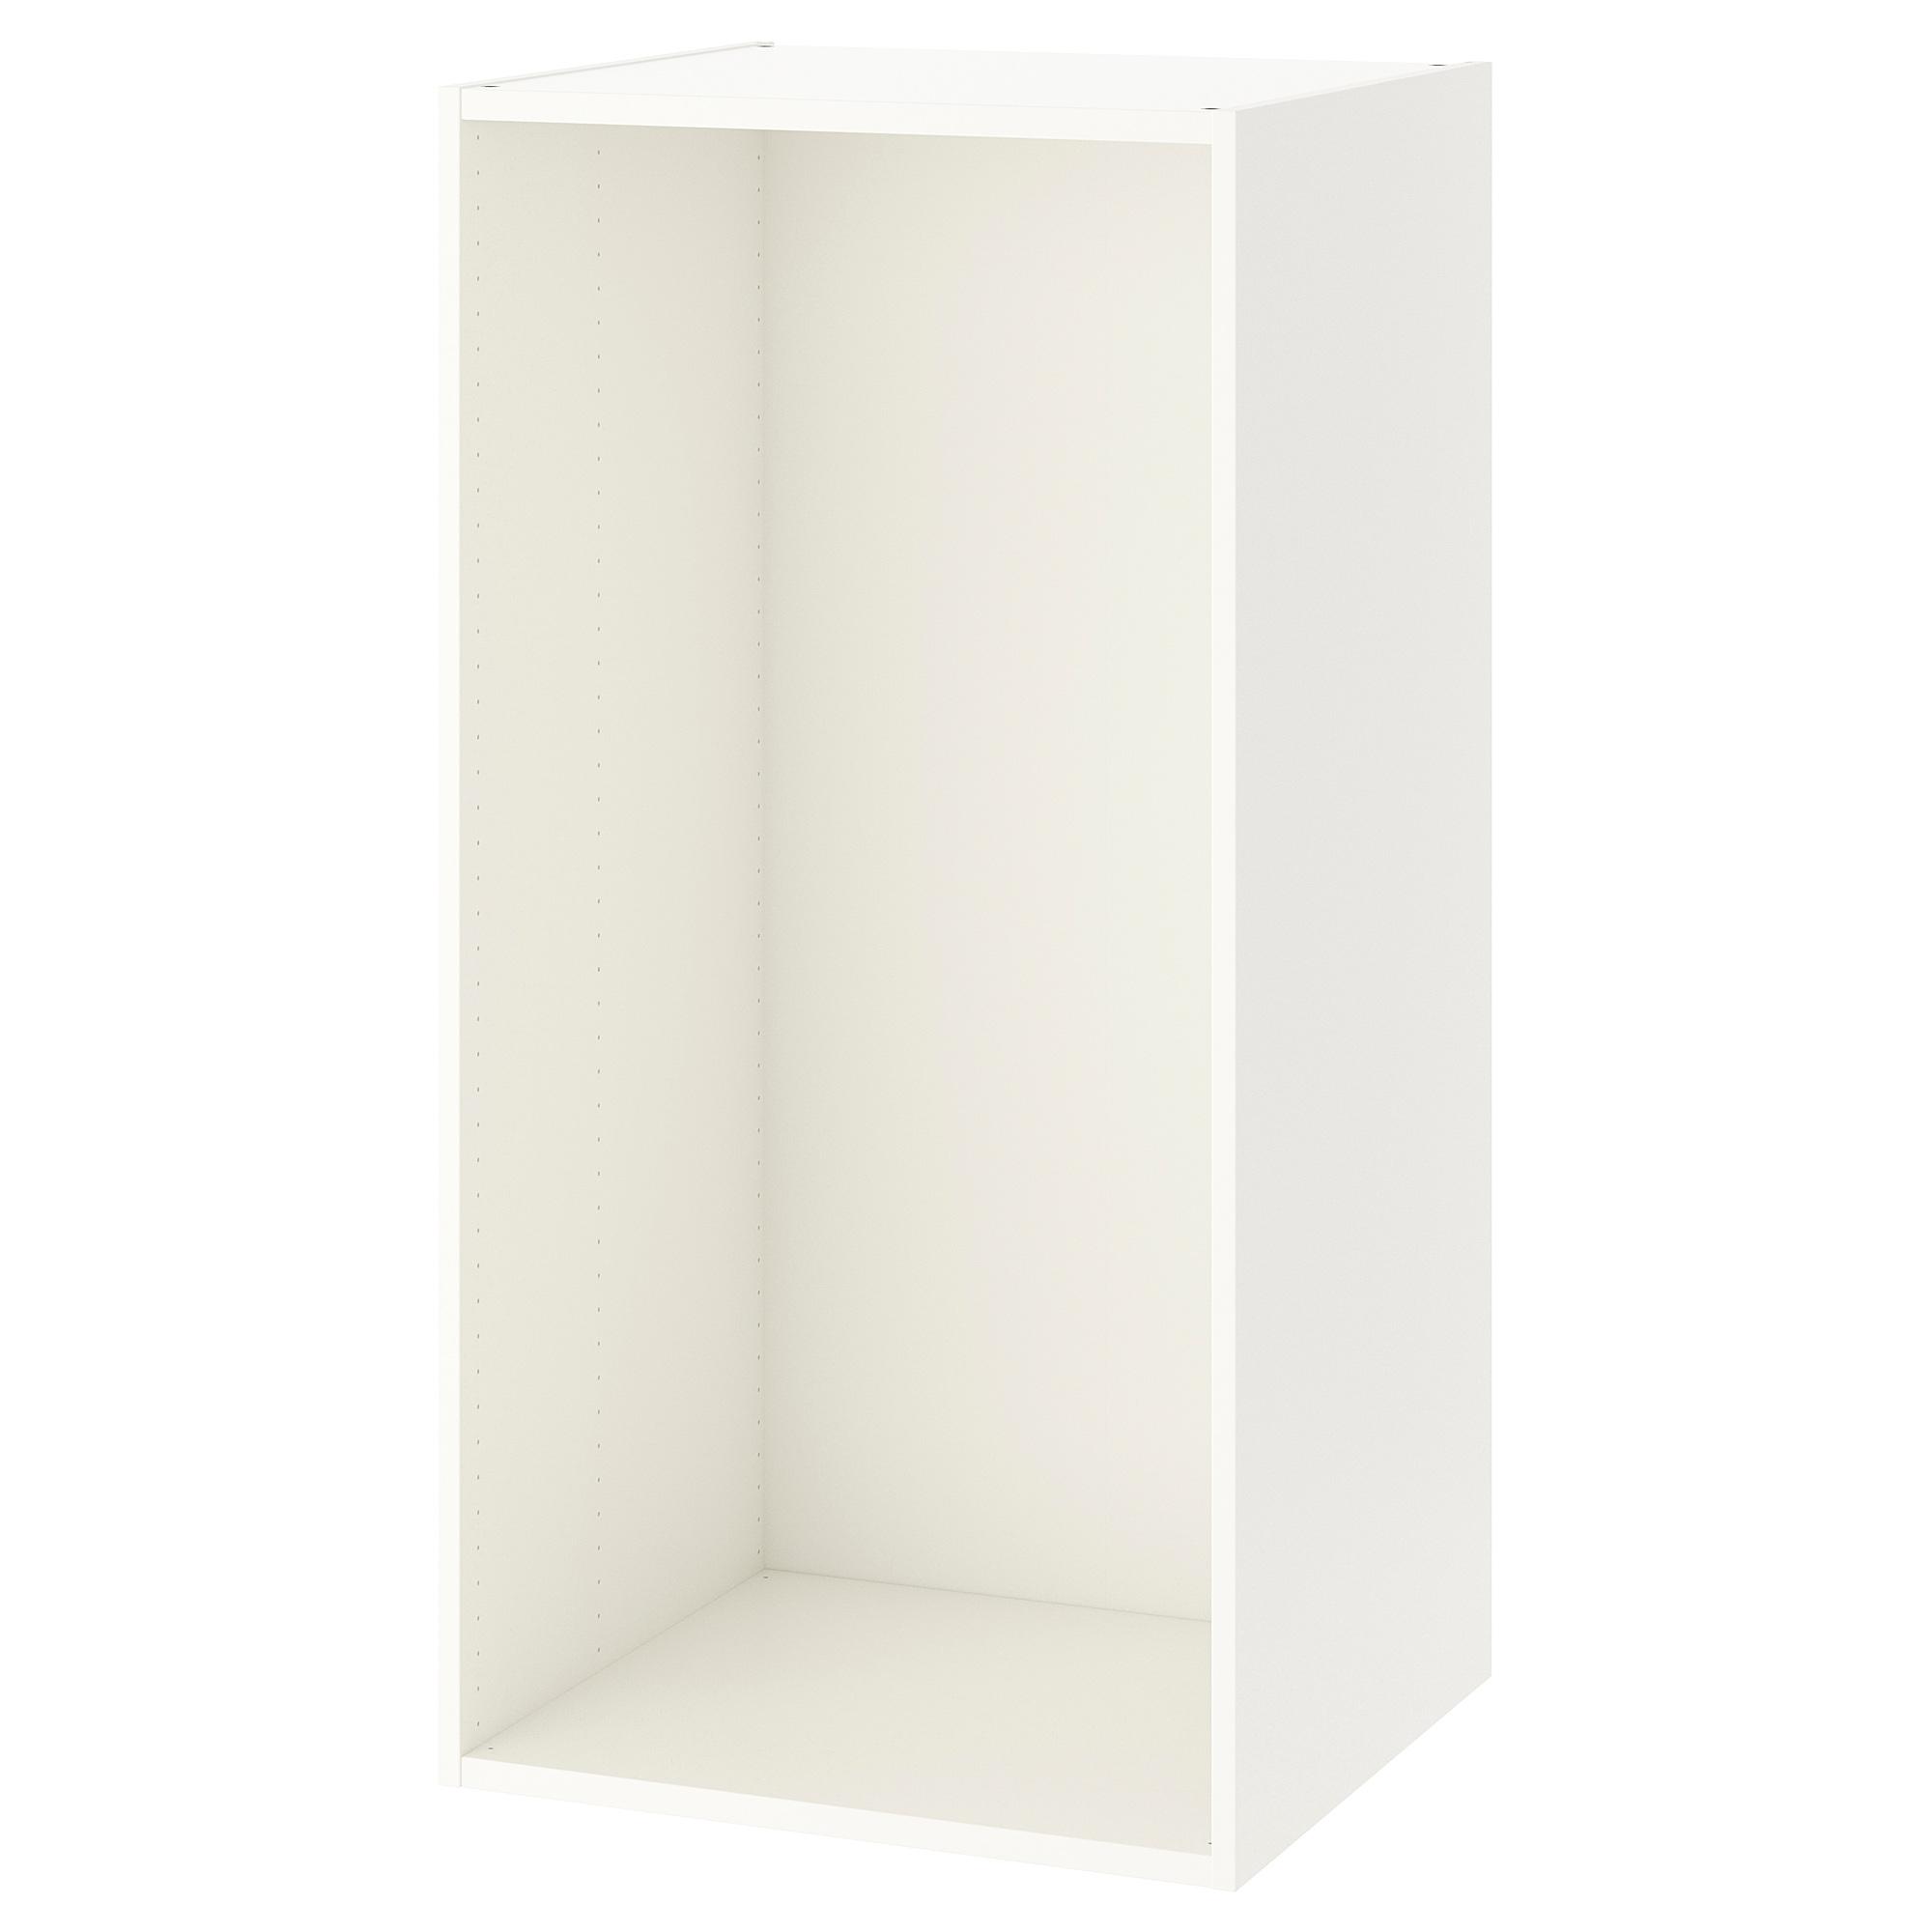 Colonna Dispensa Cucina Ikea platsa stomme - vit 60x55x120 cm | ikea, modular storage